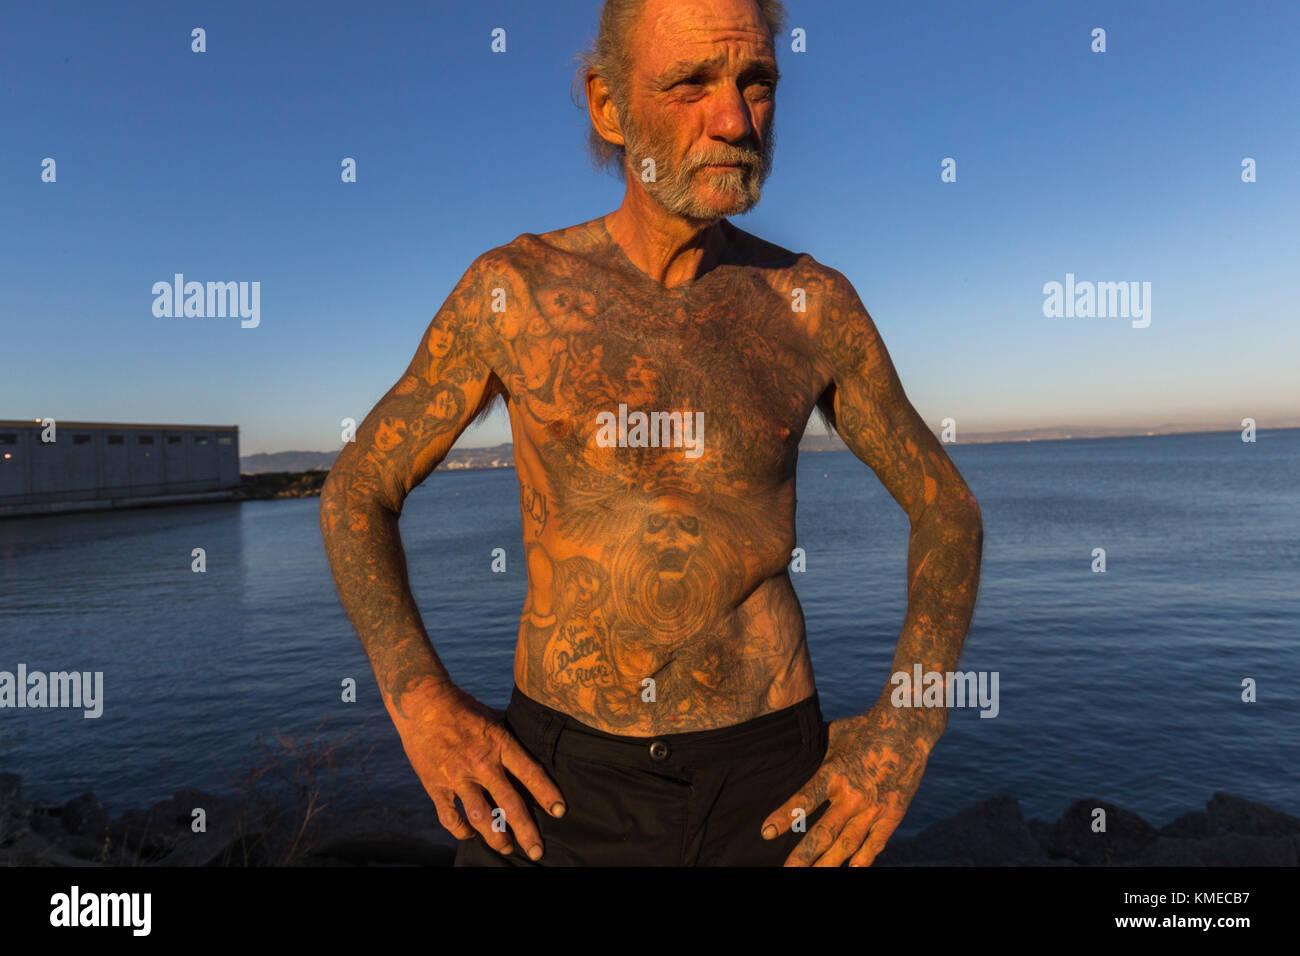 Retrato del hombre sin hogar en agua tibia cove park, san Francisco, California, EE.UU. Imagen De Stock